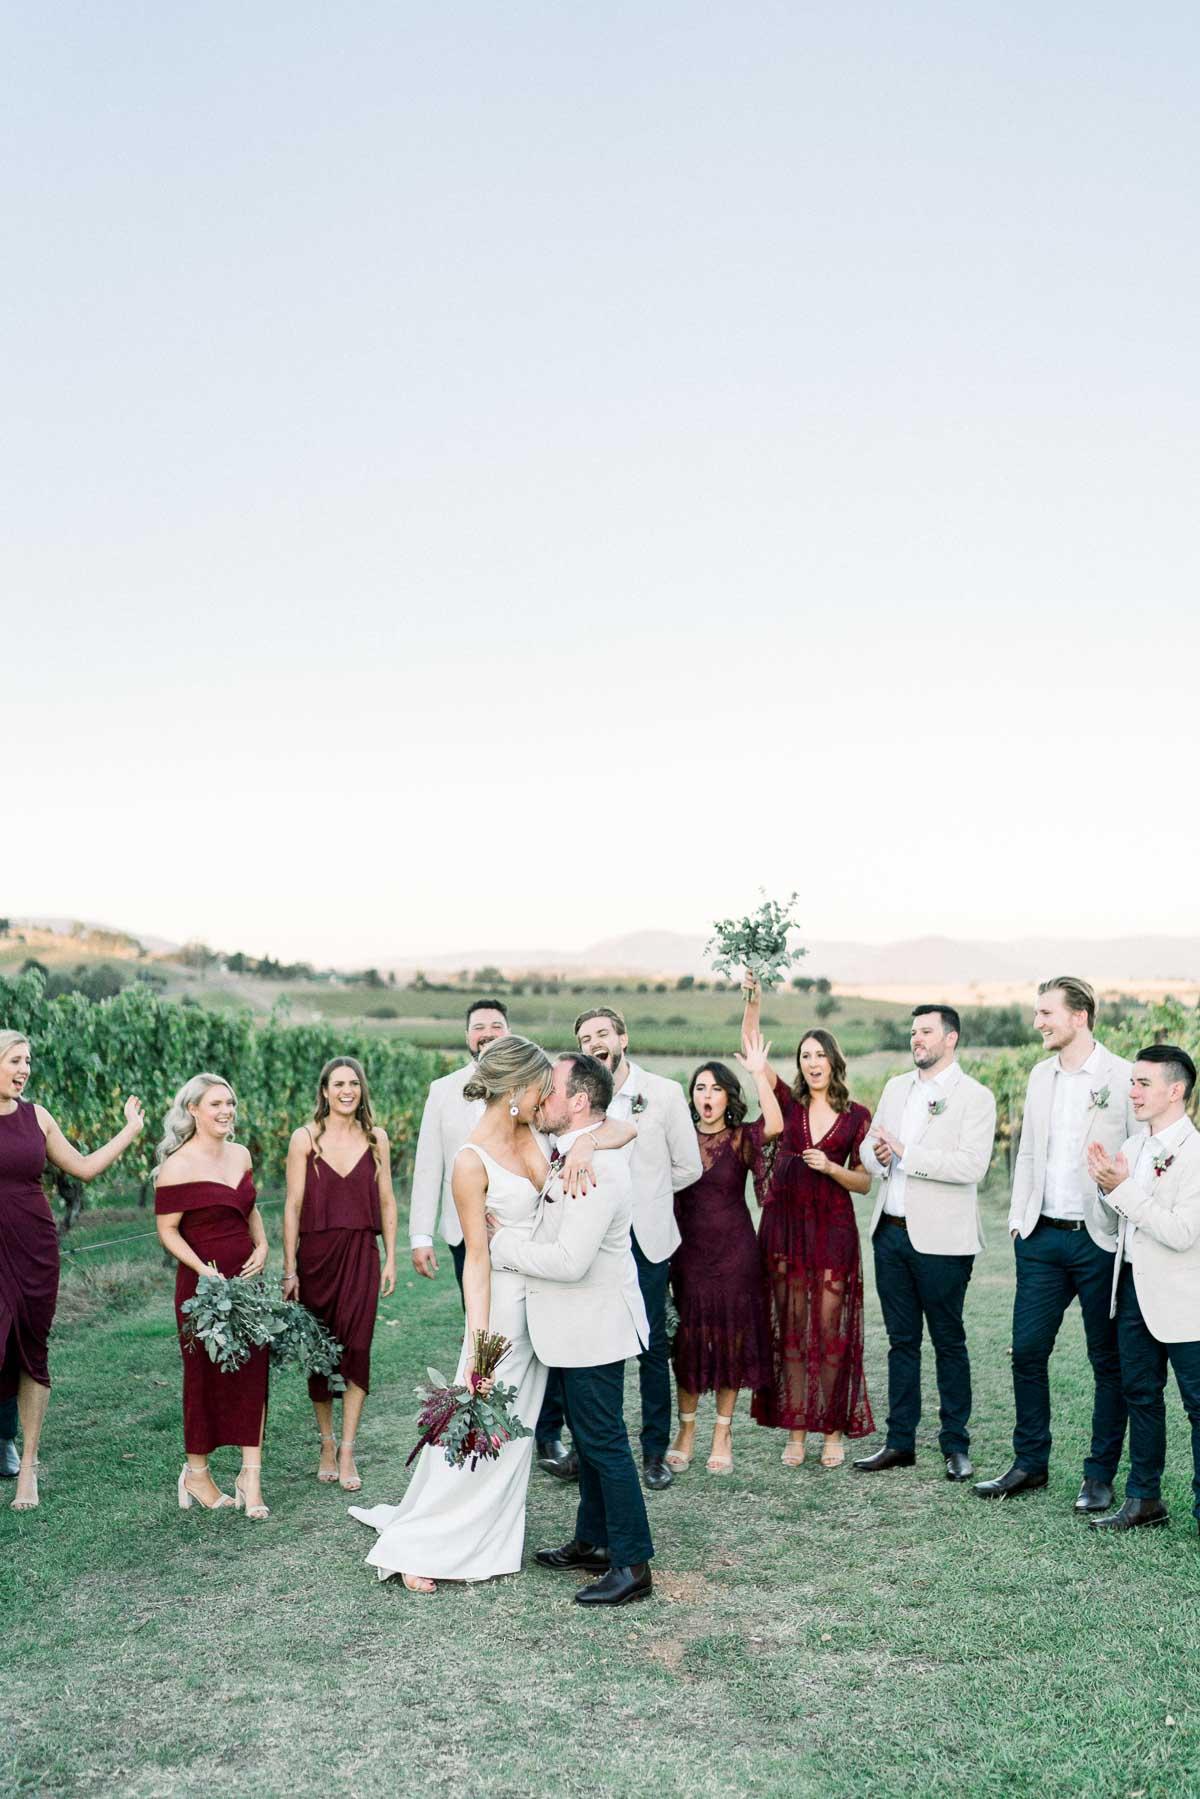 rustic-yarra-valley-wedding-venue-acacia-ridge-georgia-james-08278.jpg